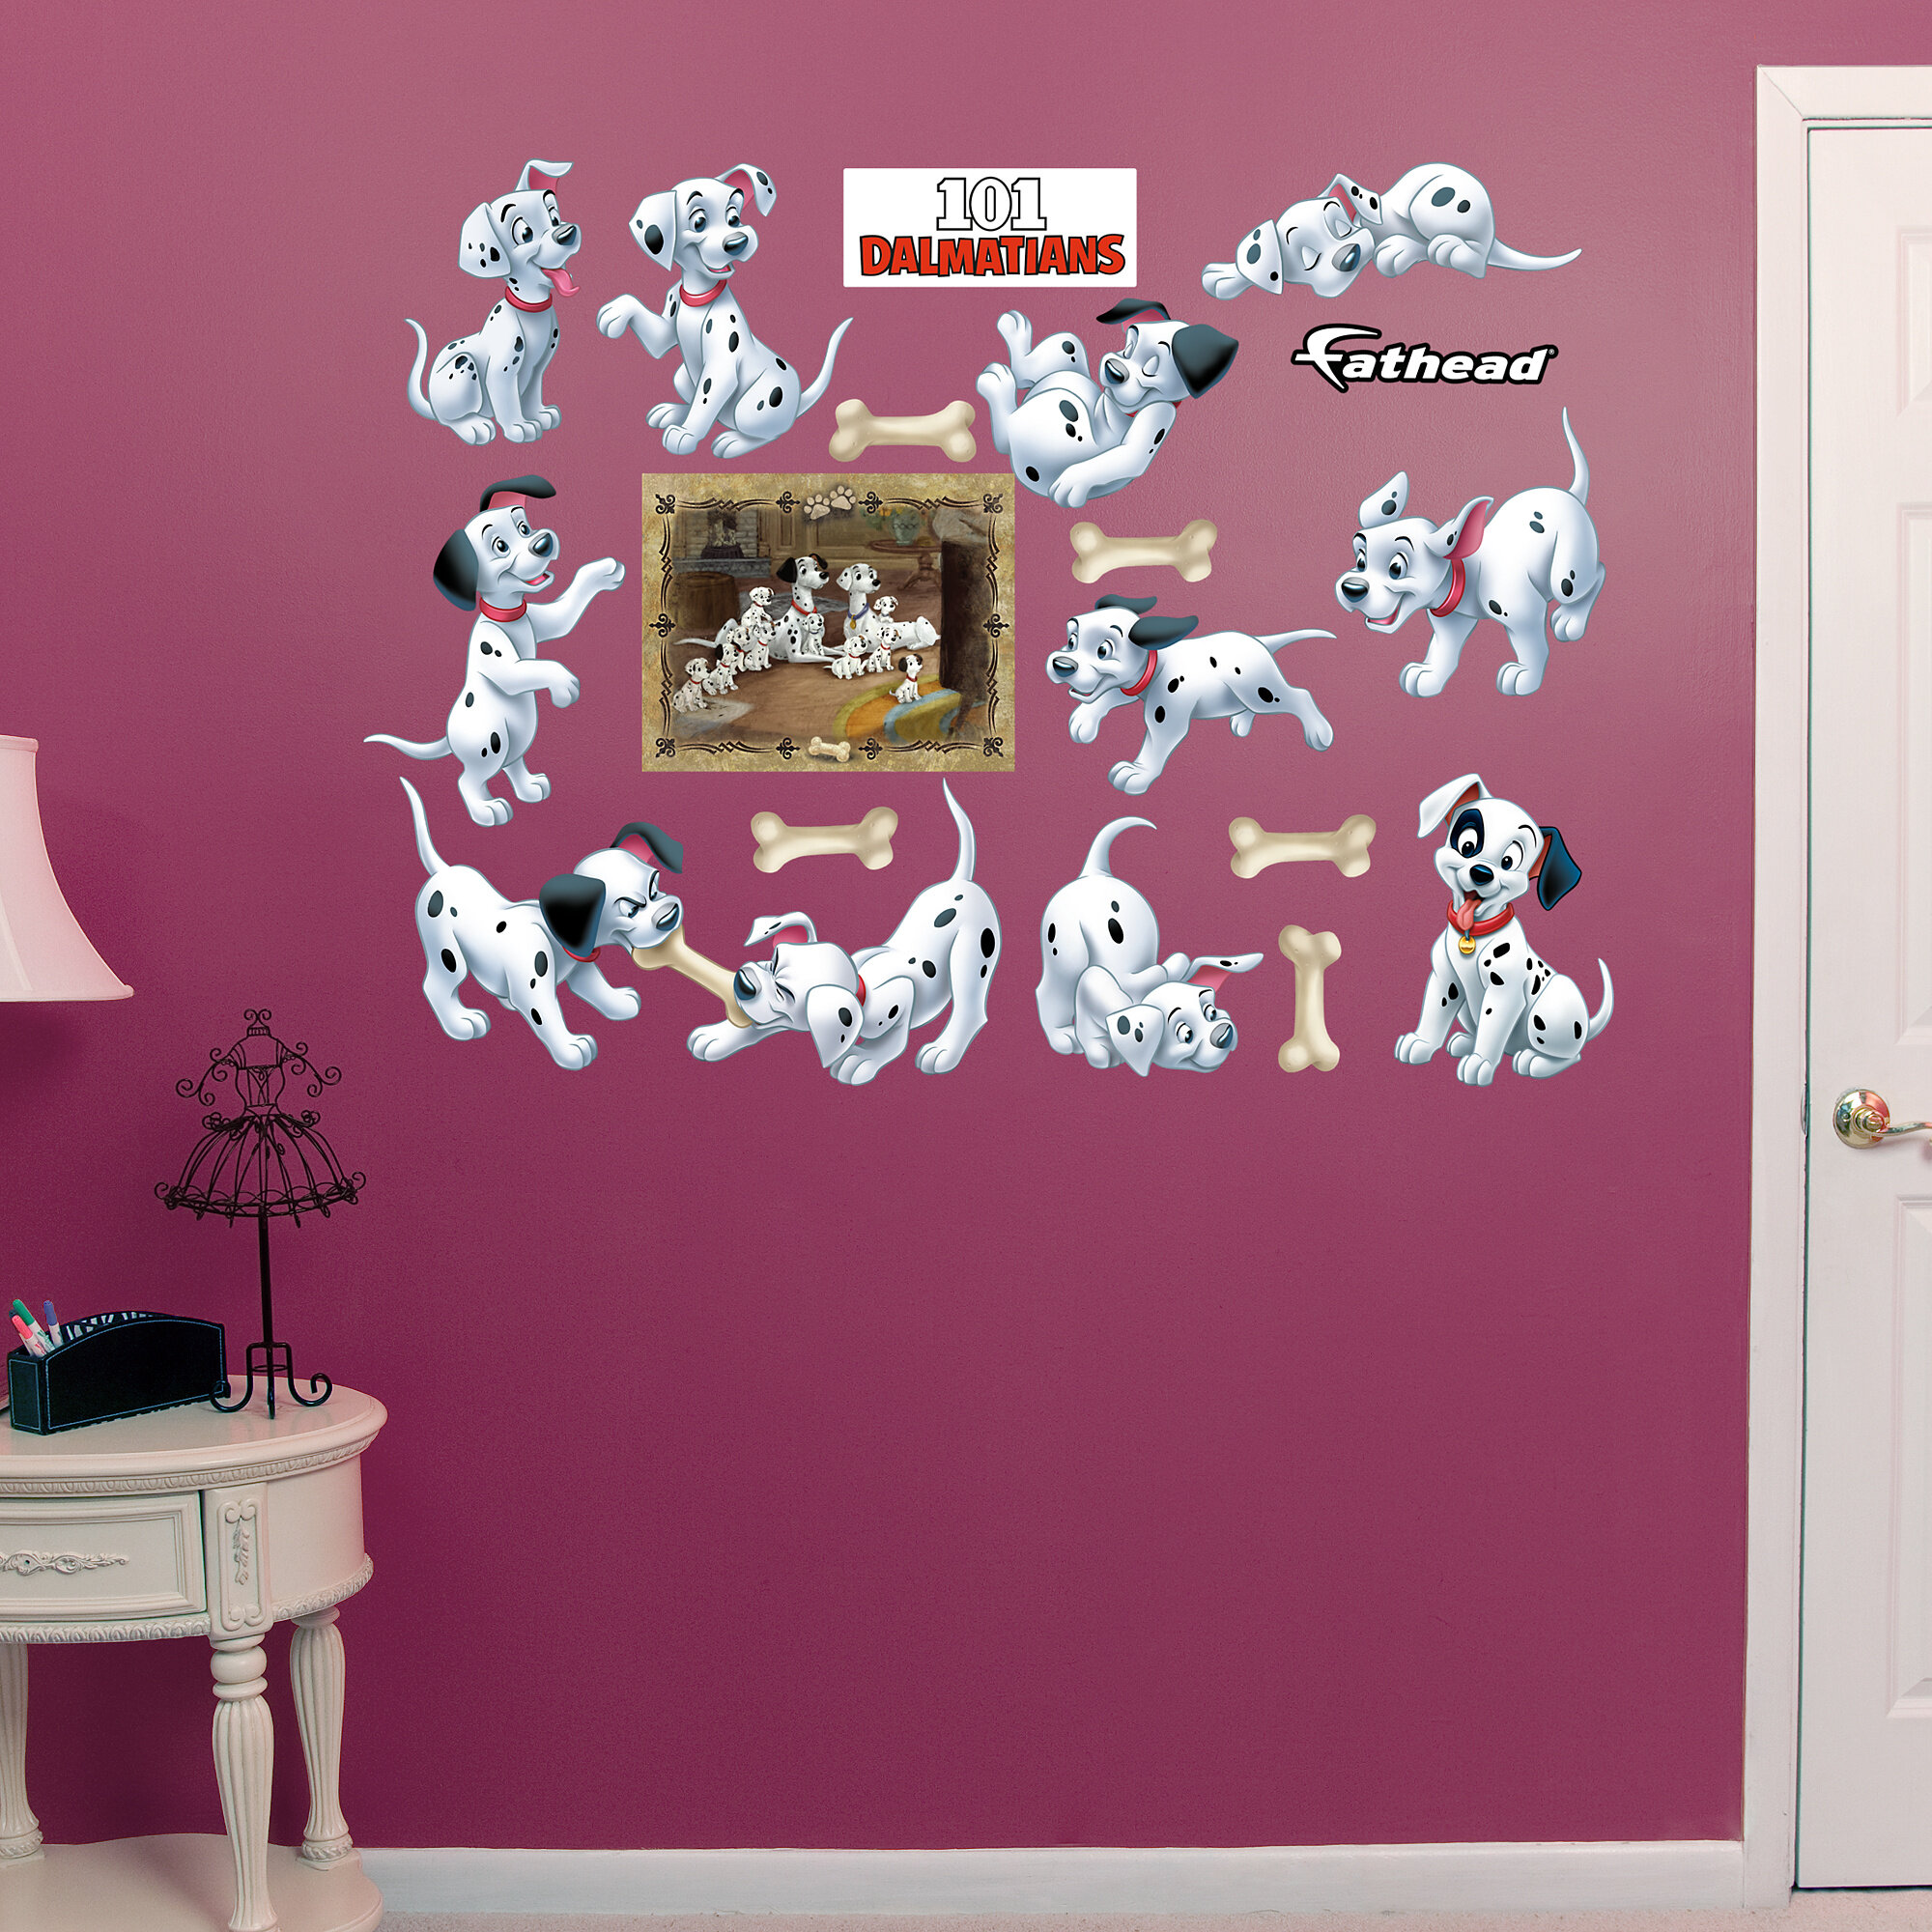 Disney Dalmatians 101 Wall Sticker